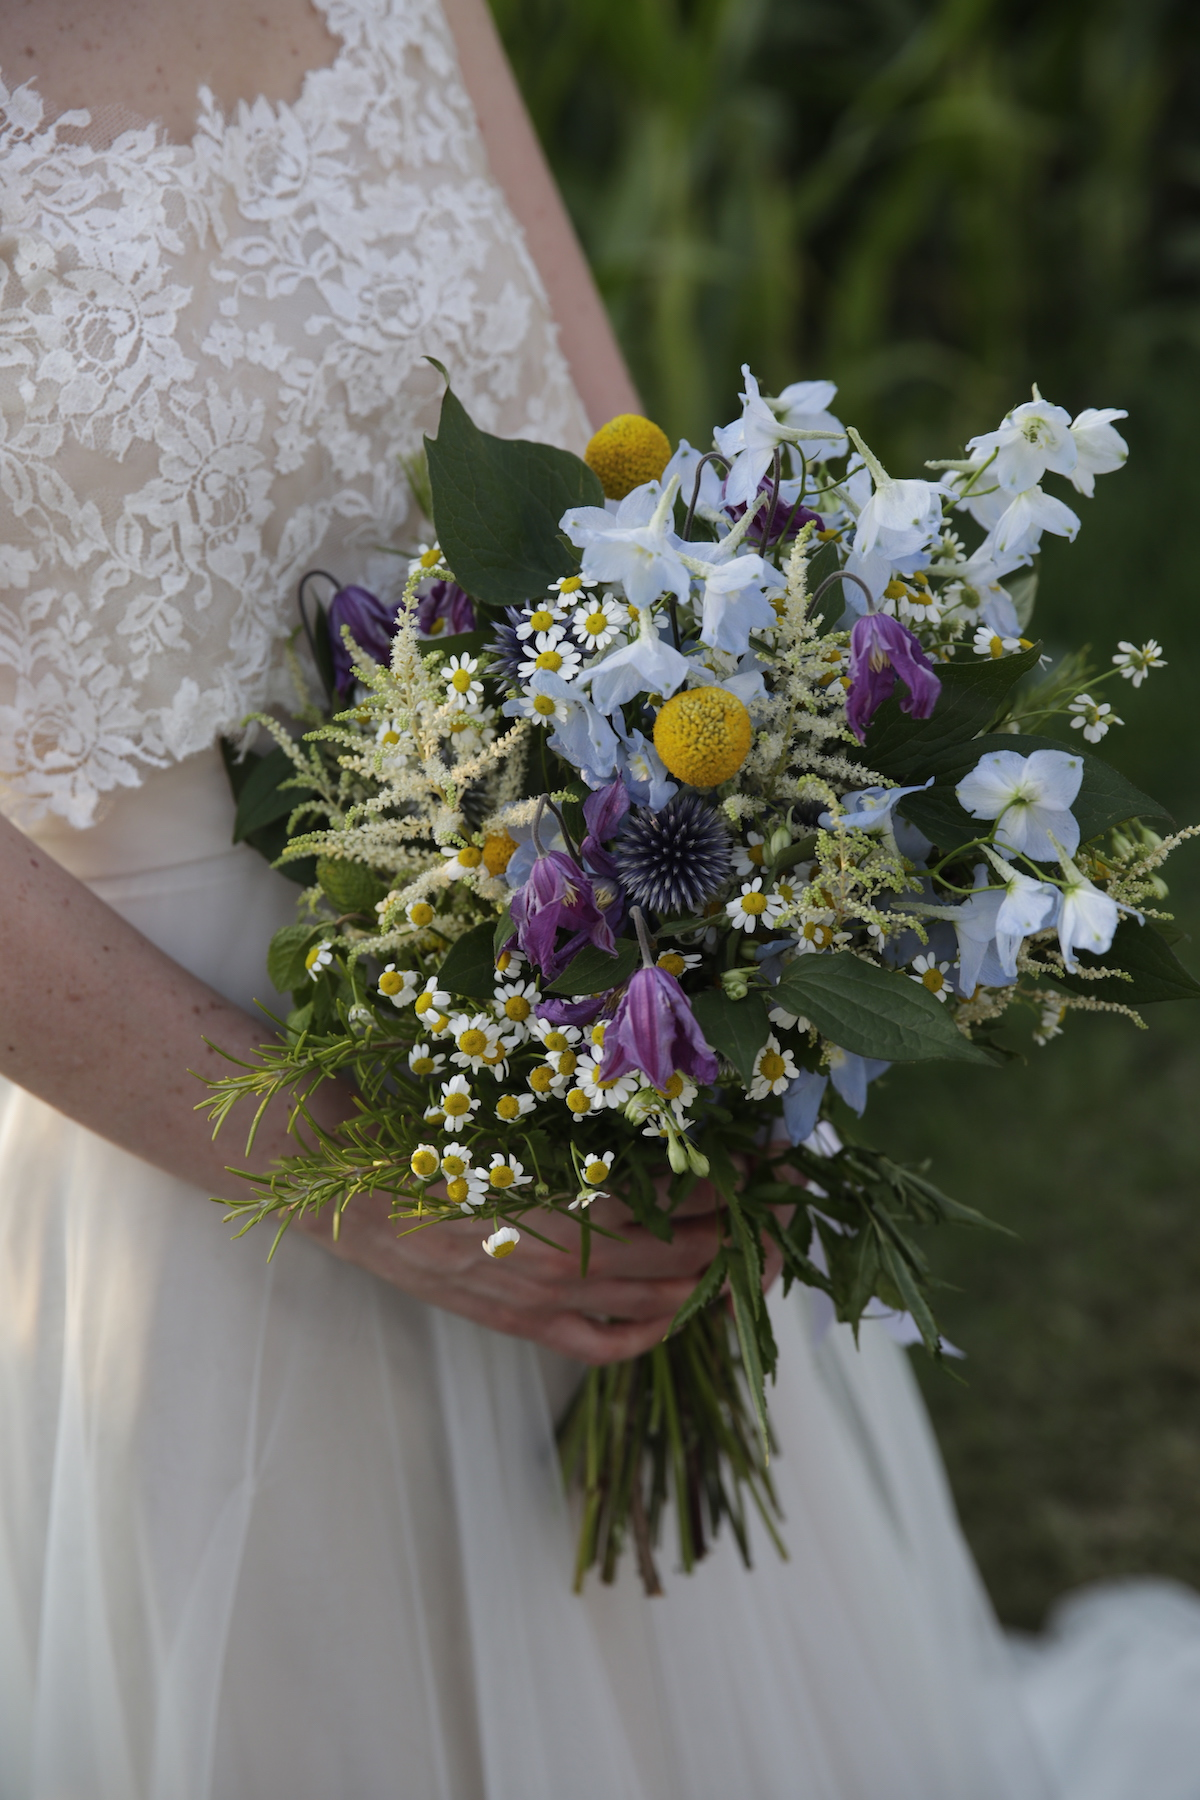 aa-bouquet-sposa-camomilla